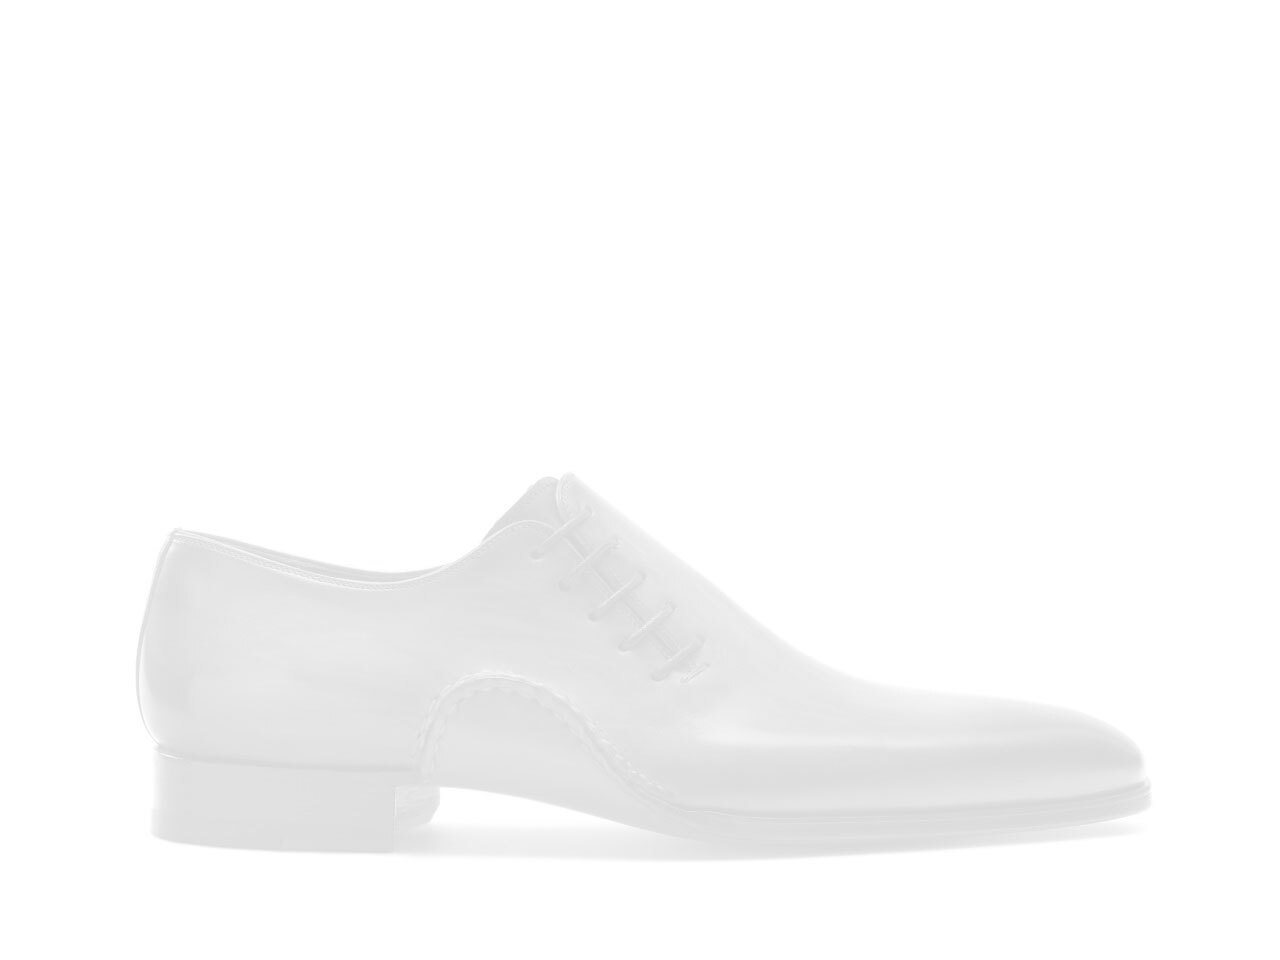 Magnanni Casual Dress Sock Beige Men's Casual Socks